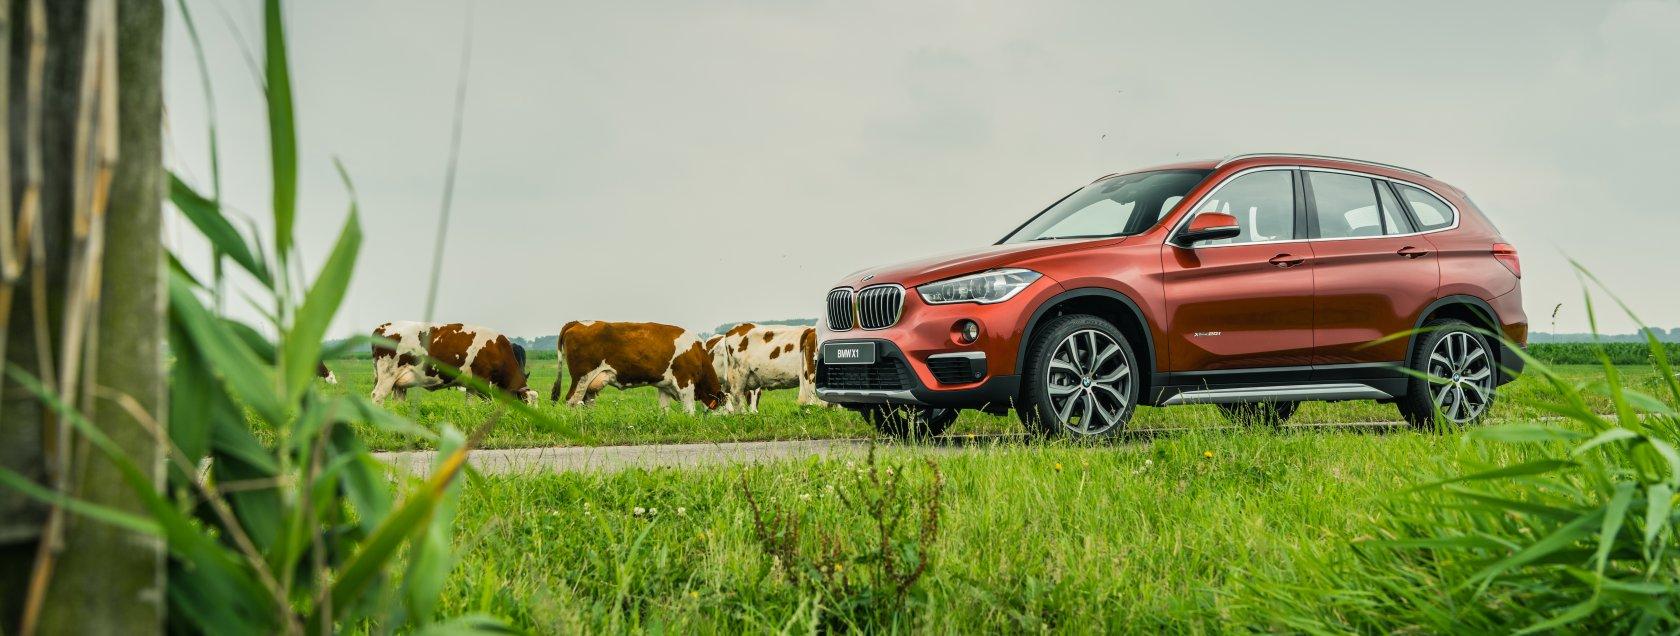 BMW X1 Orange Edition.